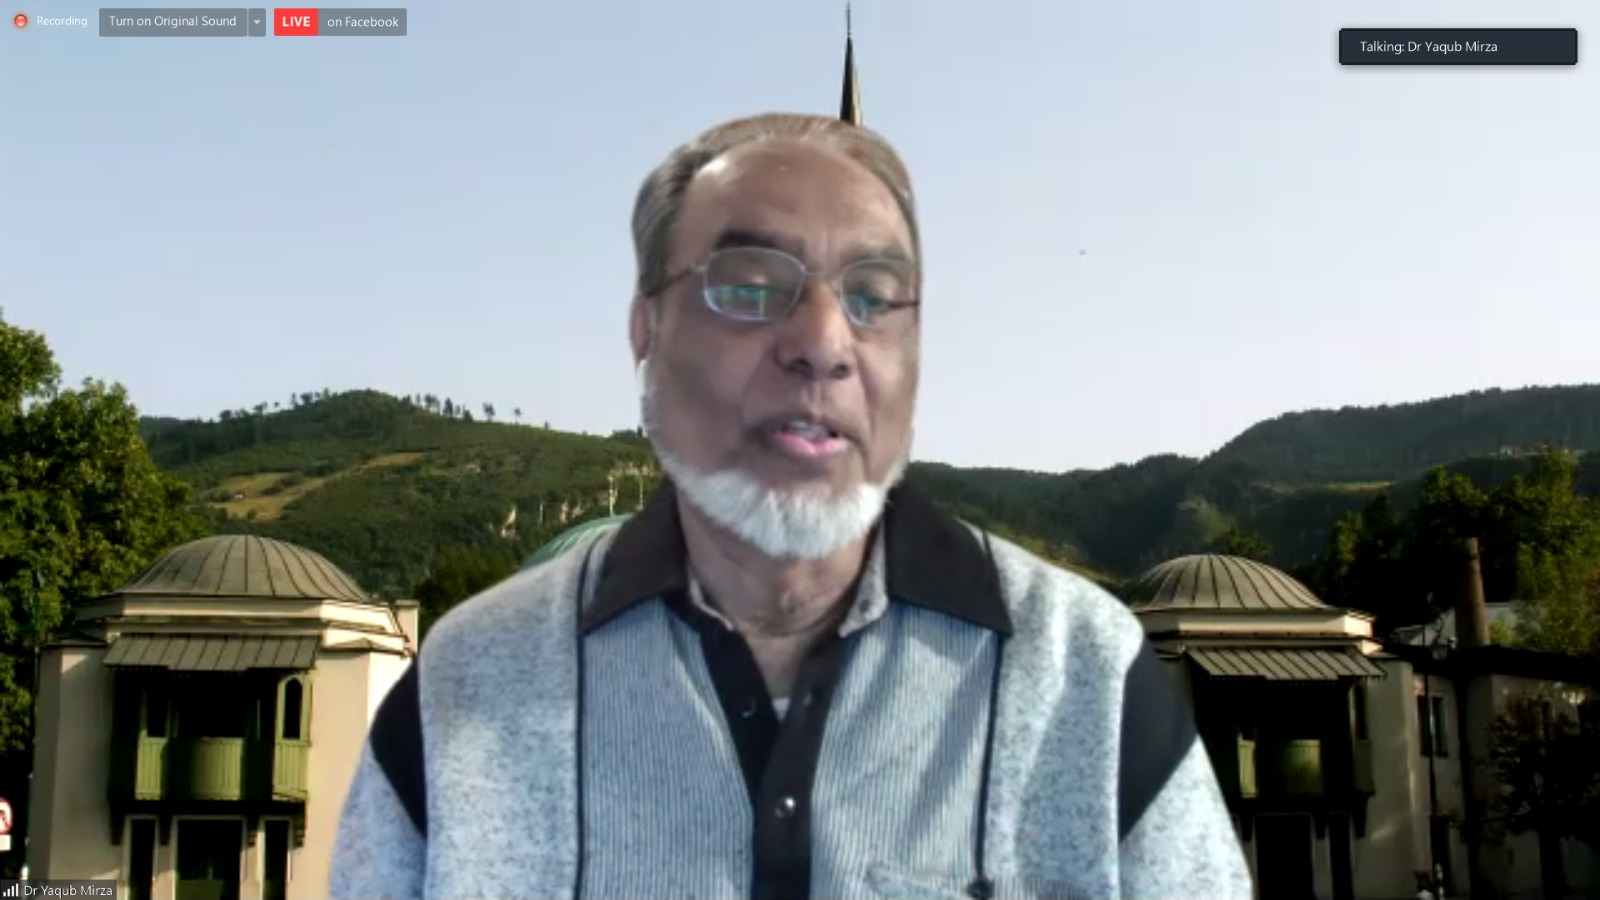 Održan webinar Pet stubova blagostanja sa dr. Yaqubom Mirzom